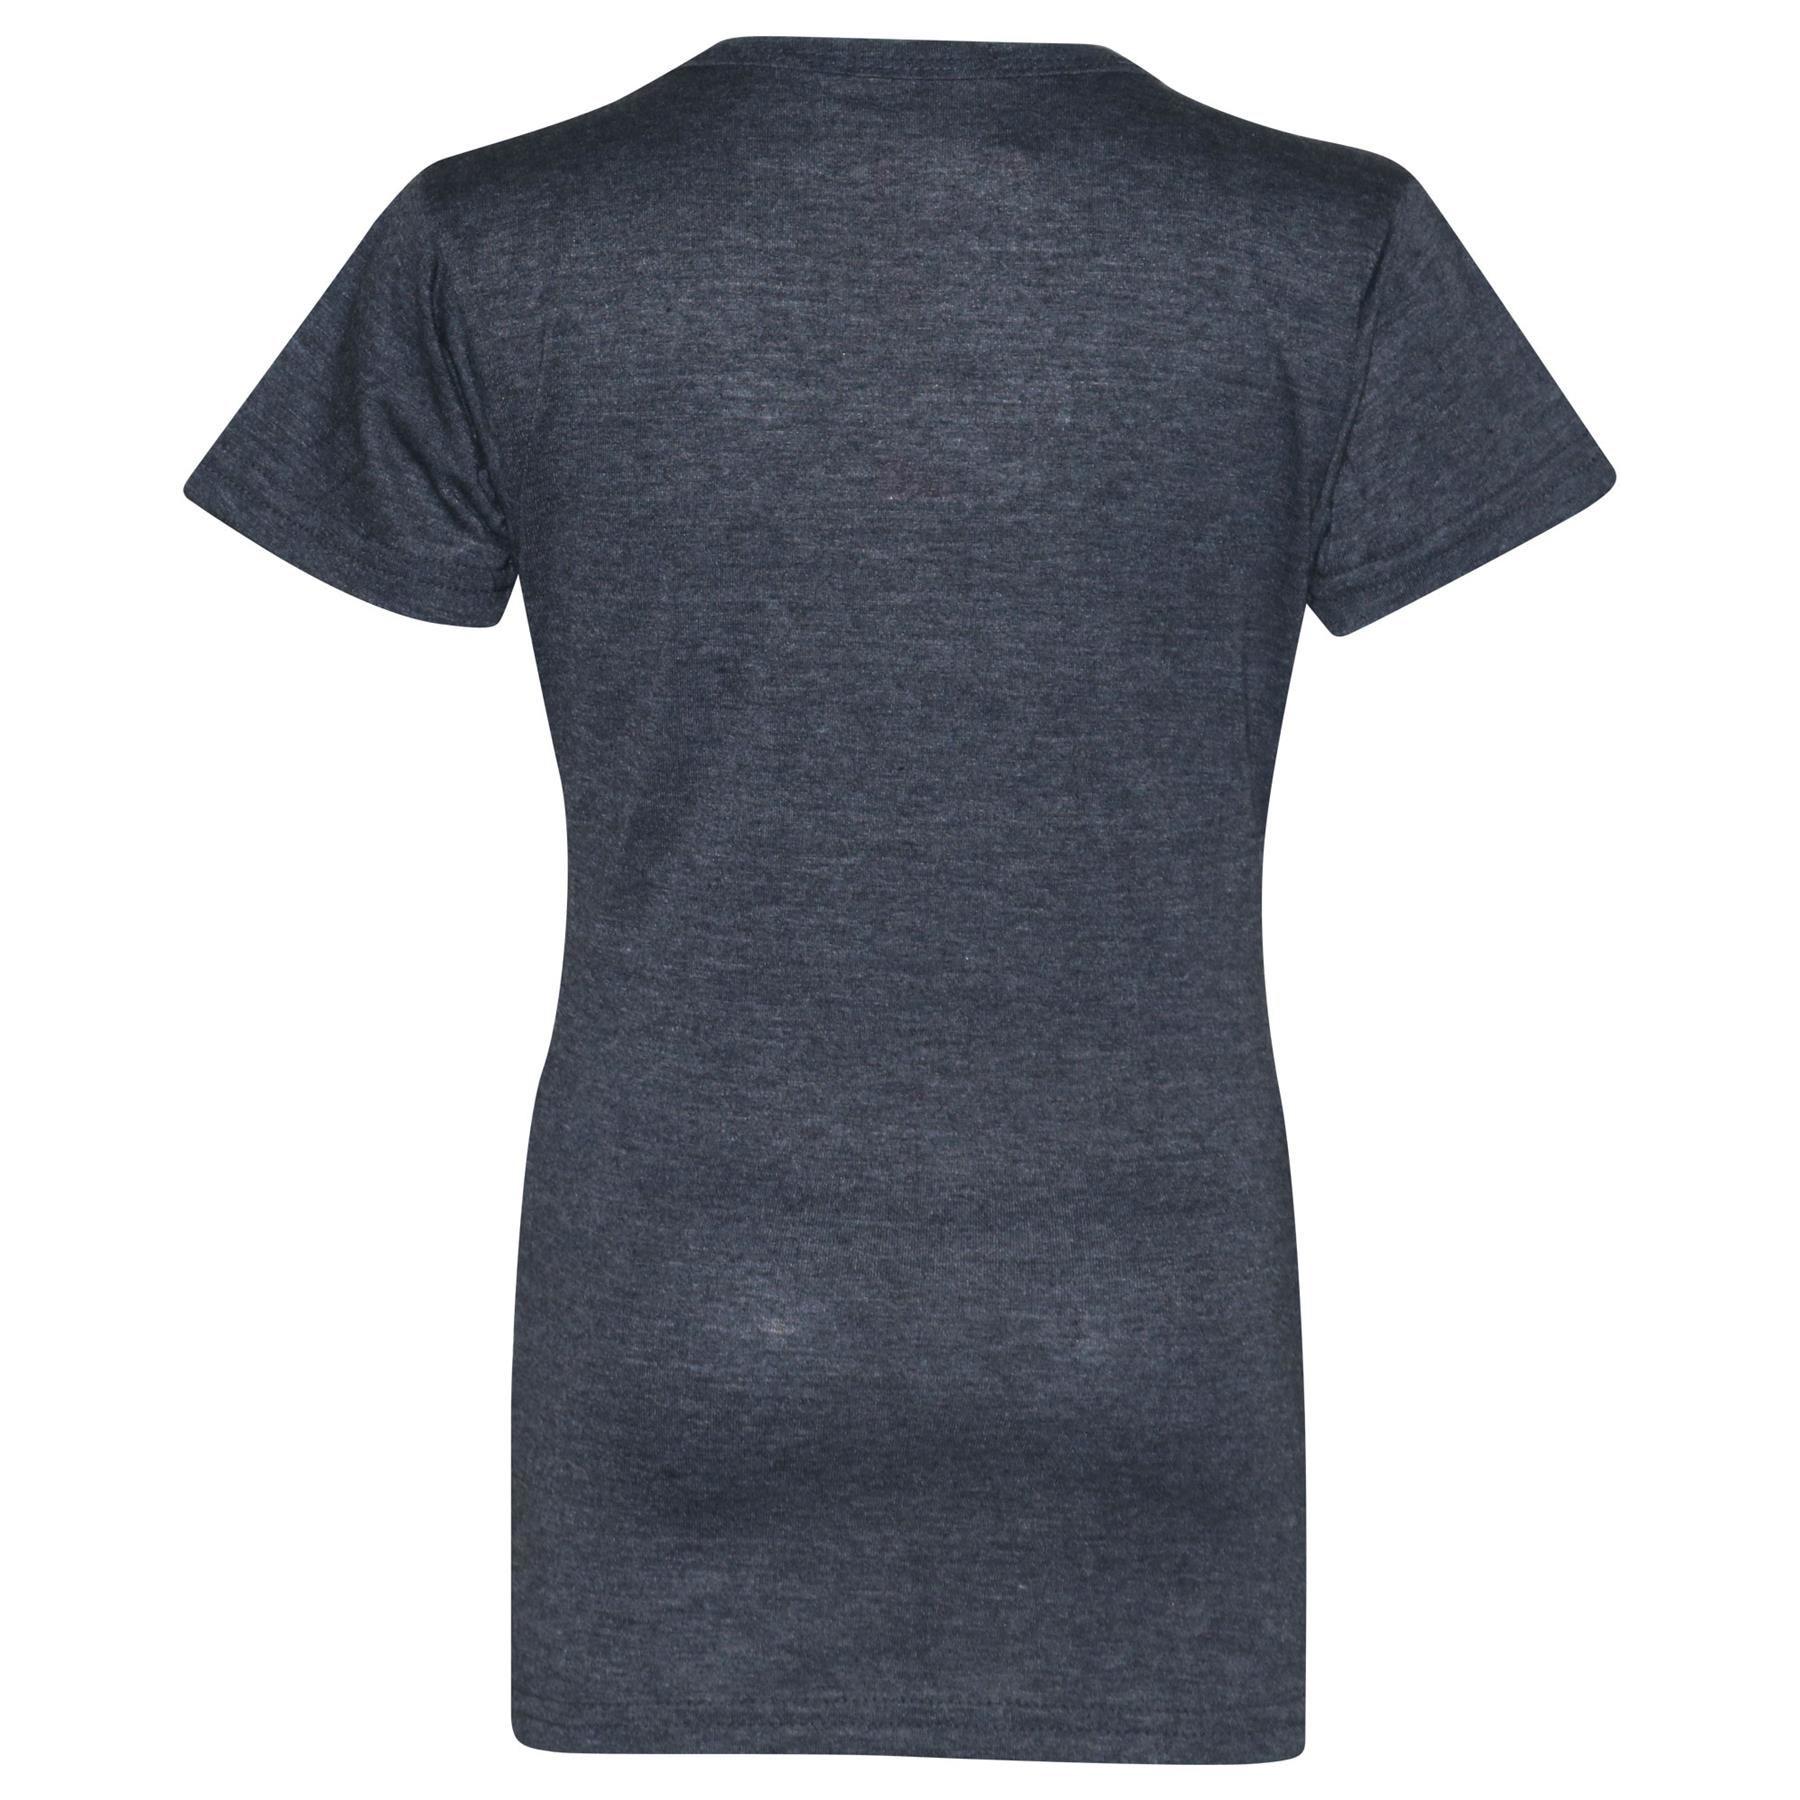 Kids-Girls-T-Shirts-Designer-100-Cotton-Plain-School-T-Shirt-Top-New-Age-3-13Yr thumbnail 14